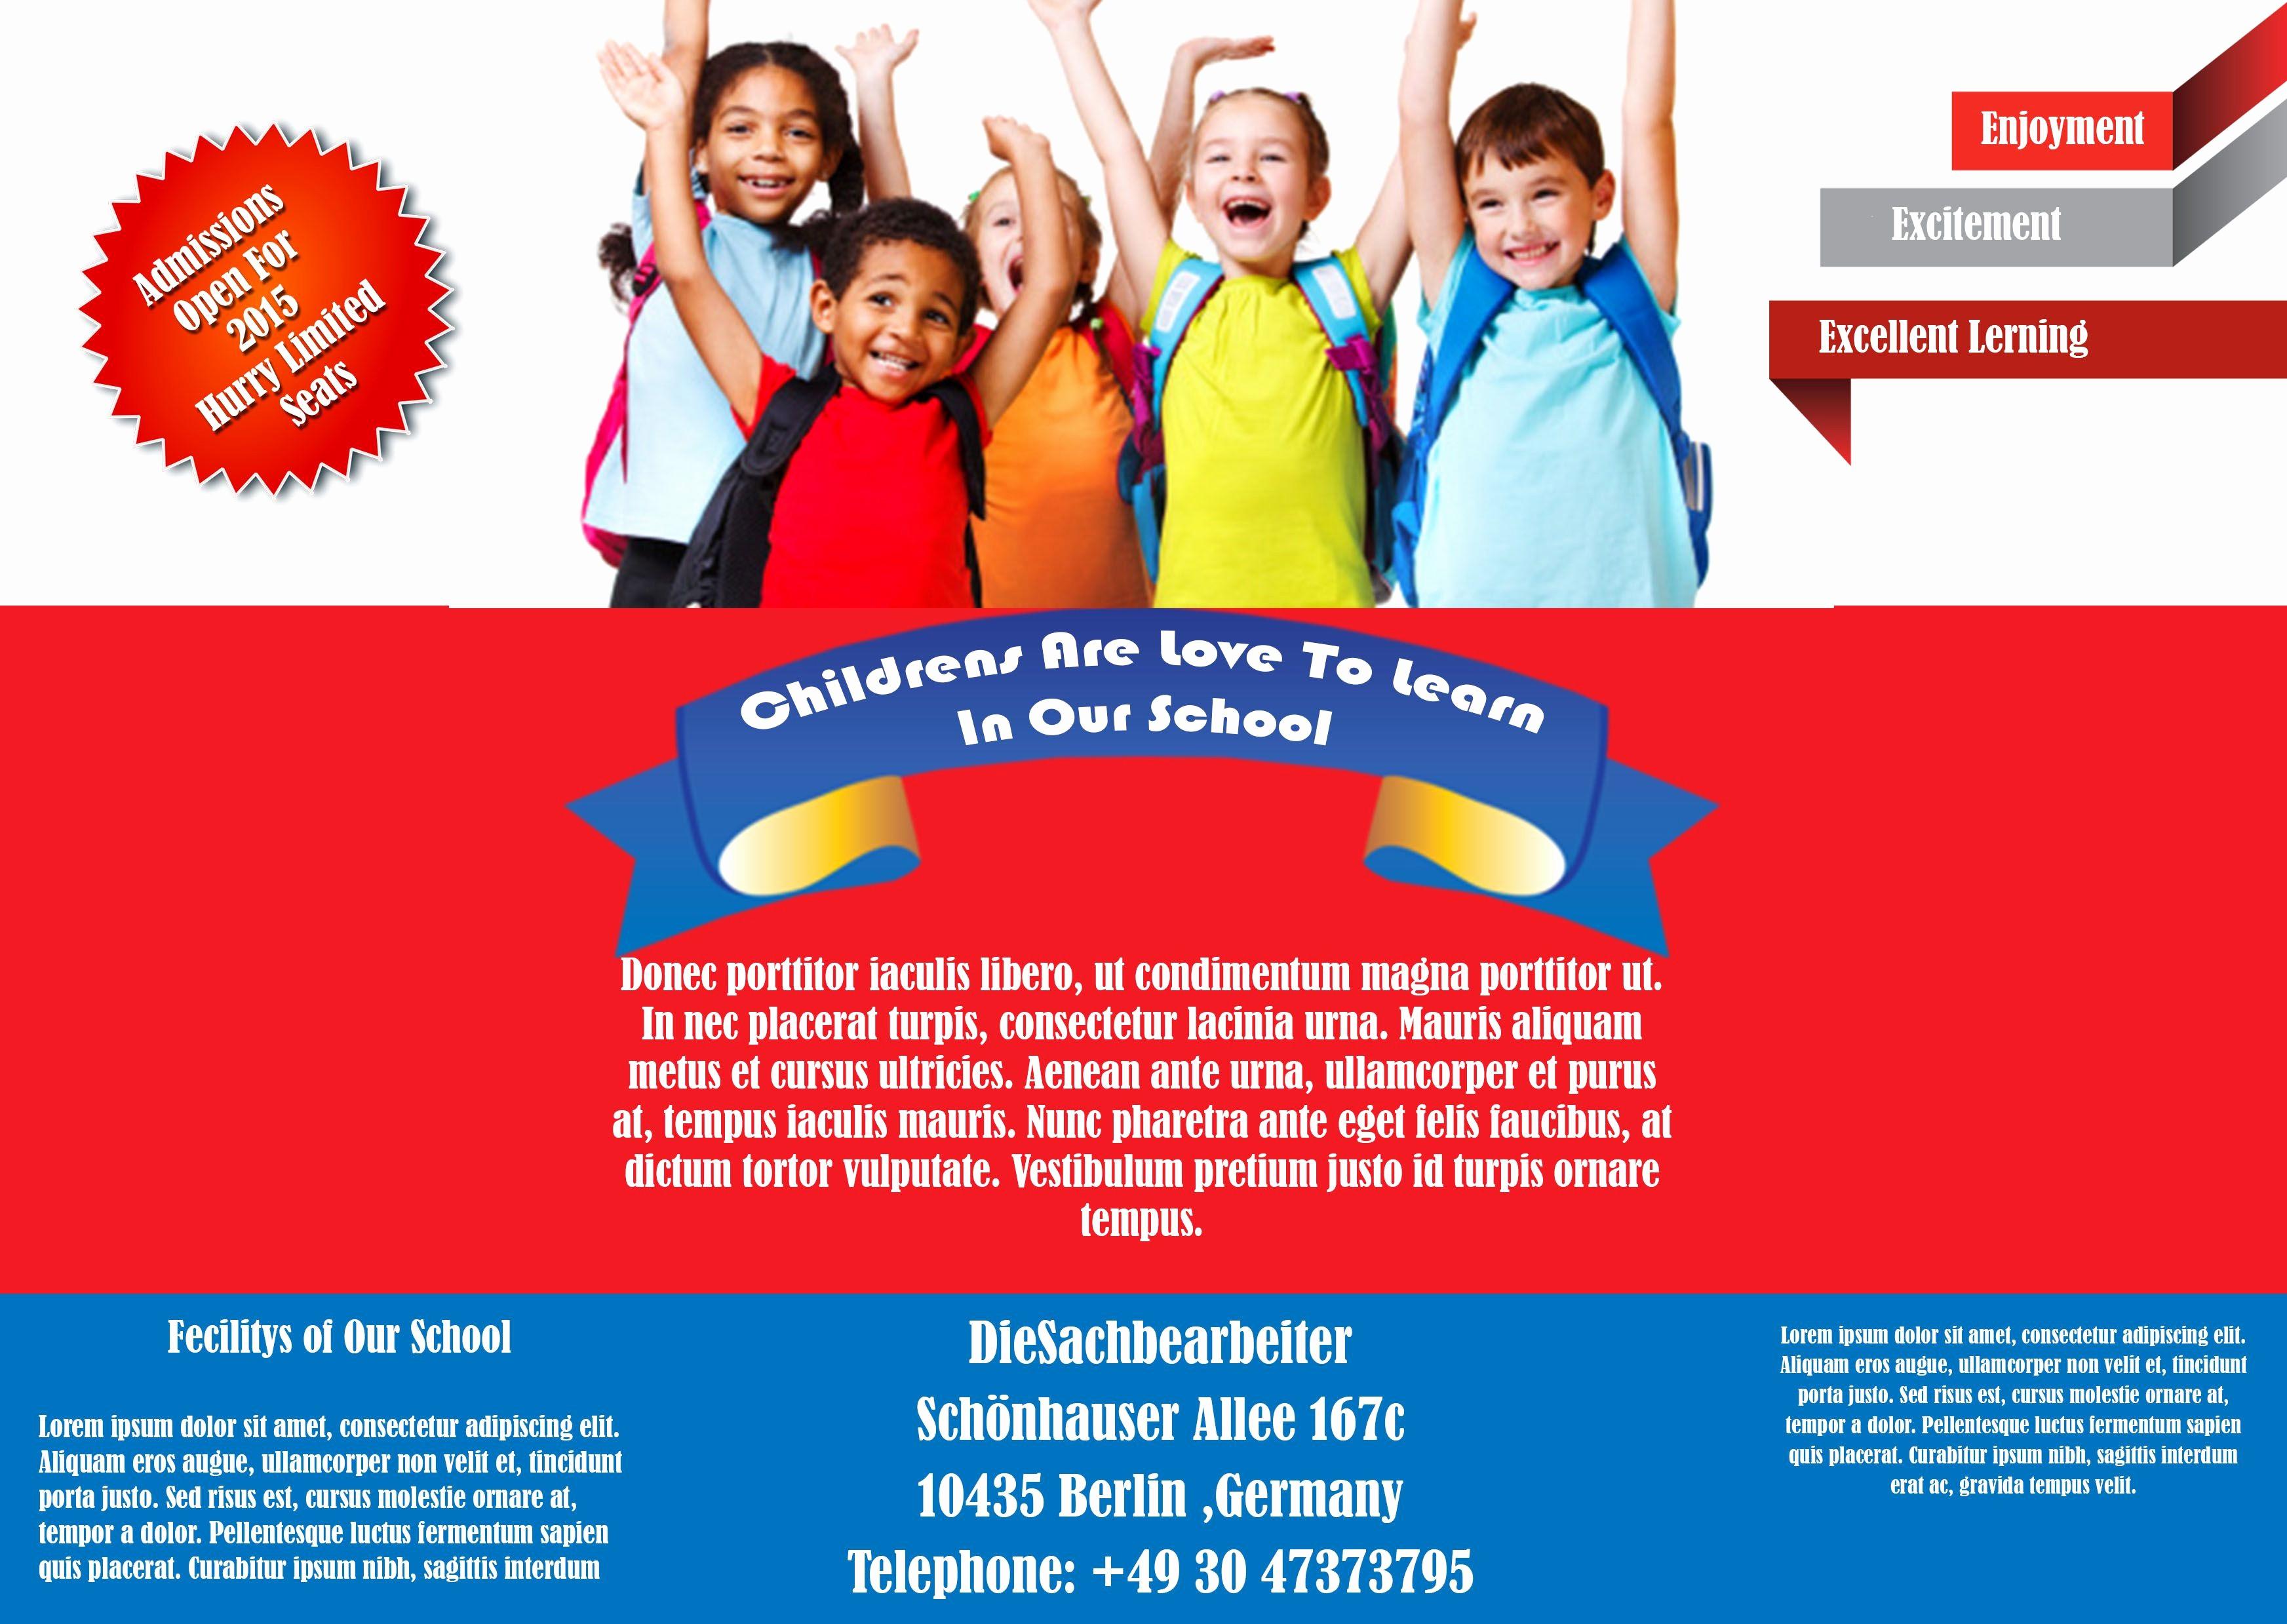 School Brochure Template Free Download Inspirational Best Free School Flyer Templates to Light Up Your Academic